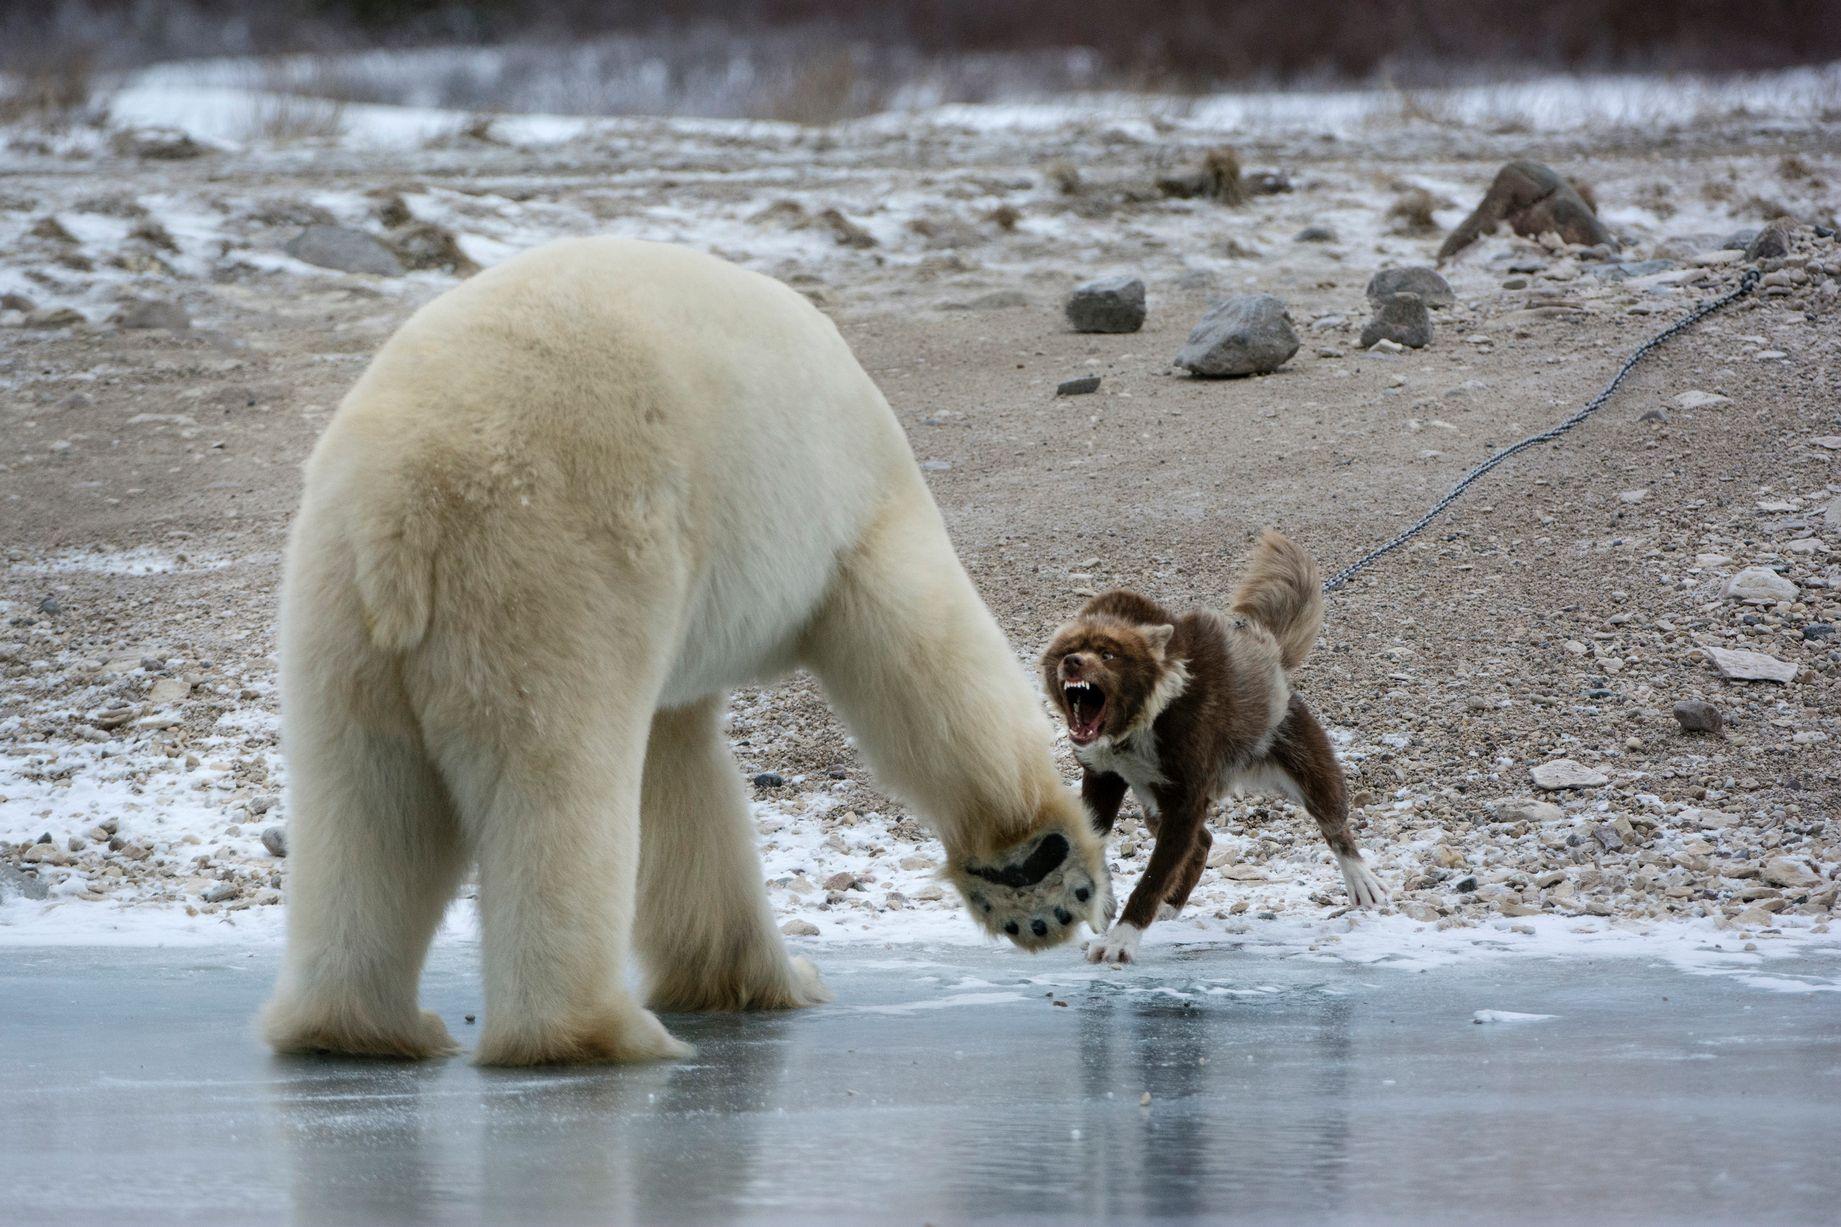 fearless guard dog went toetotoe against a huge polar